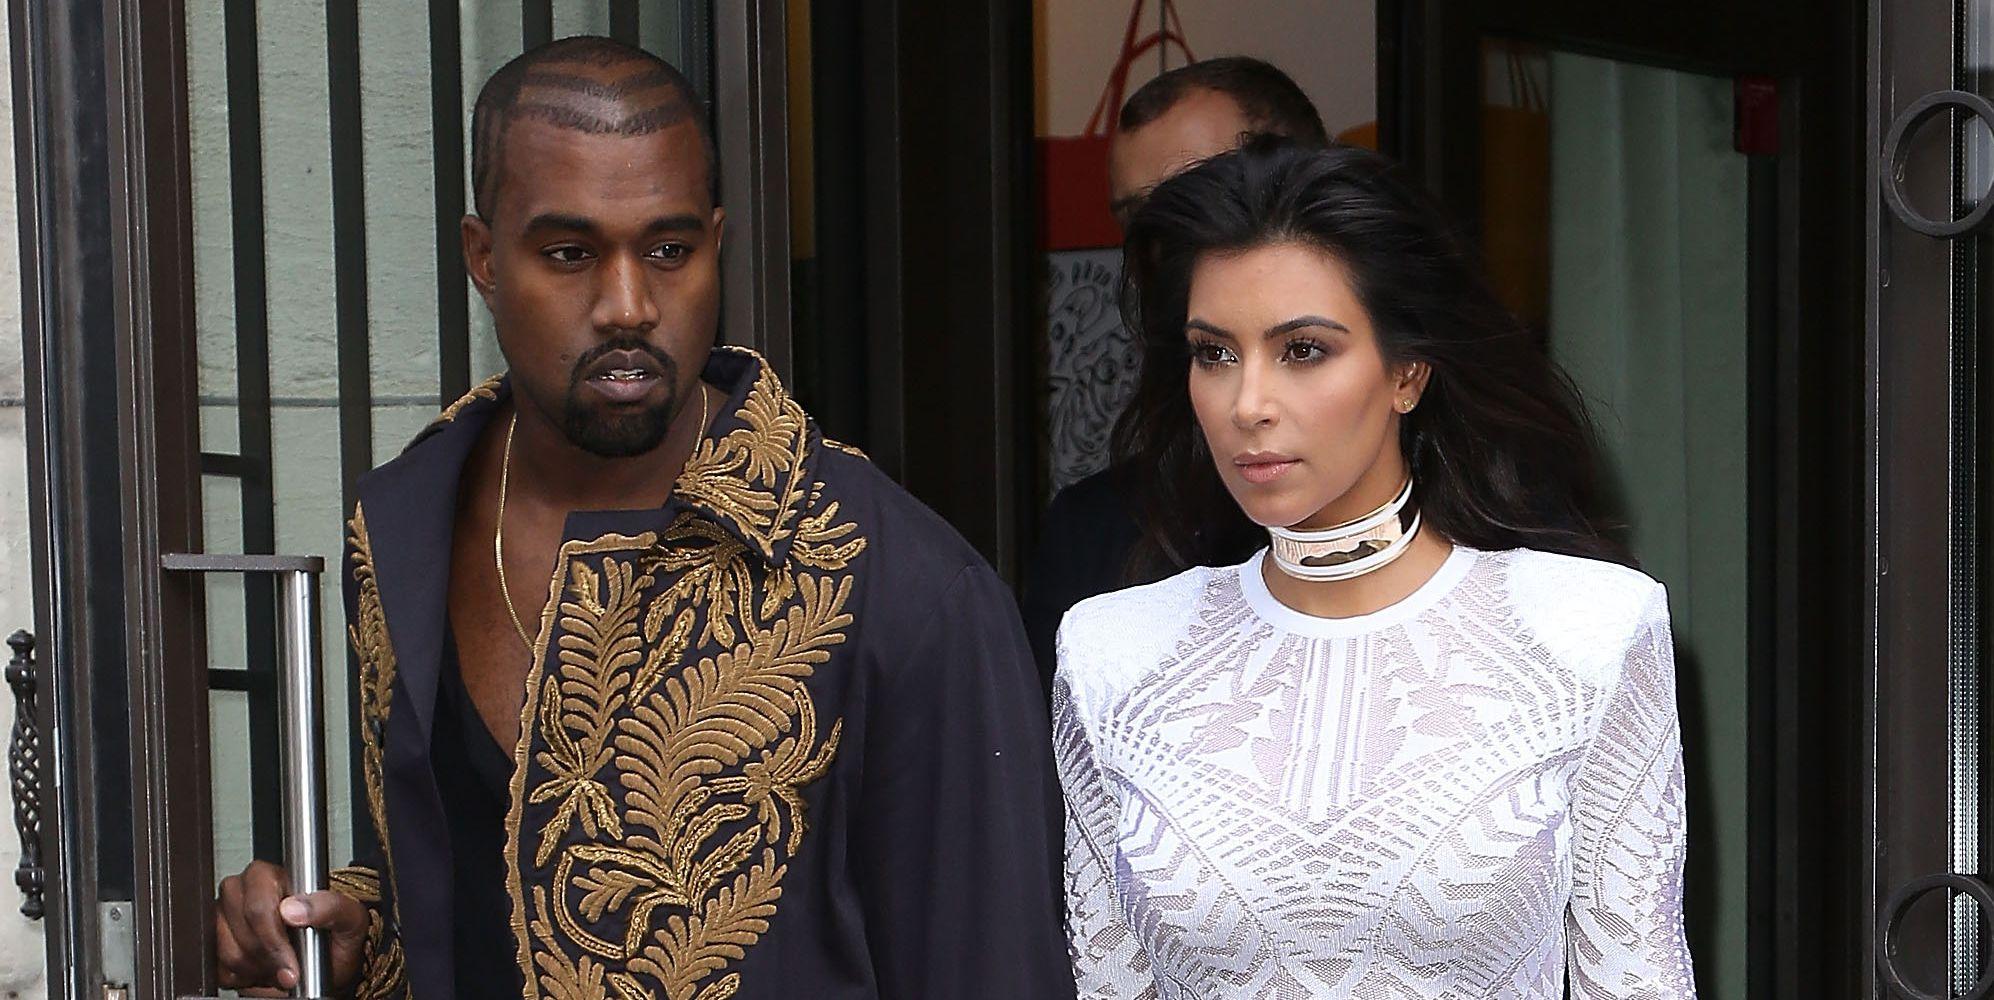 Kanye West and Kim Kardashian arriving at the Balmain Spring 2015 show